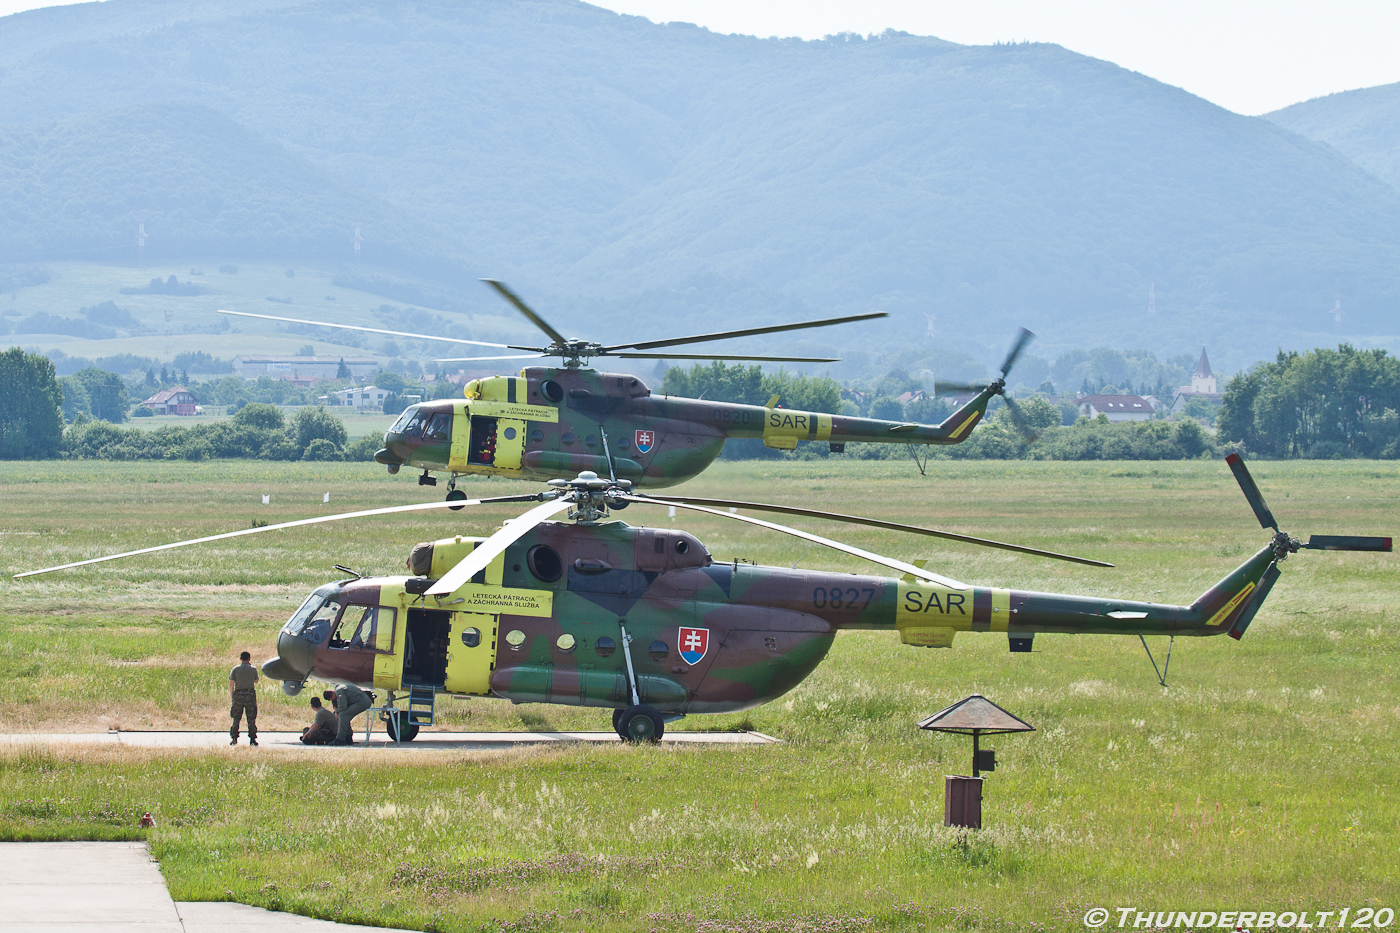 Mi-17 0820 and 0827